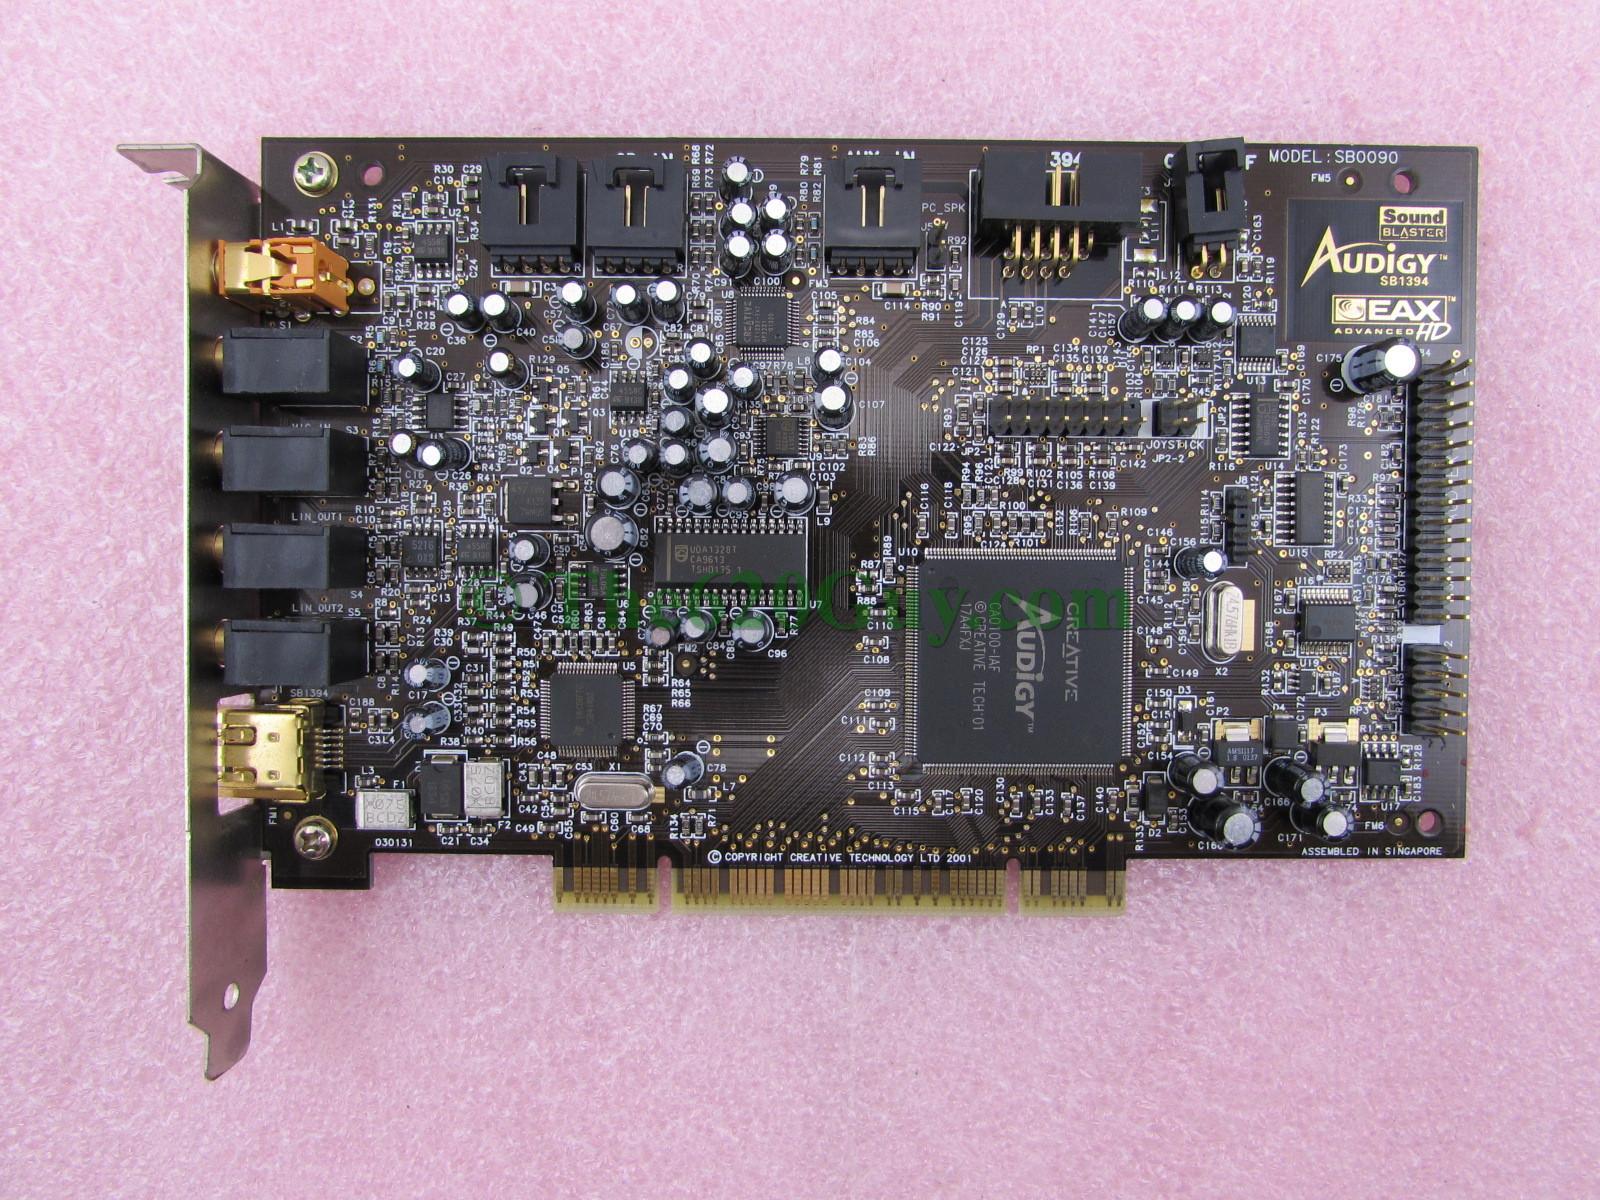 Sound blaster audigy 1394